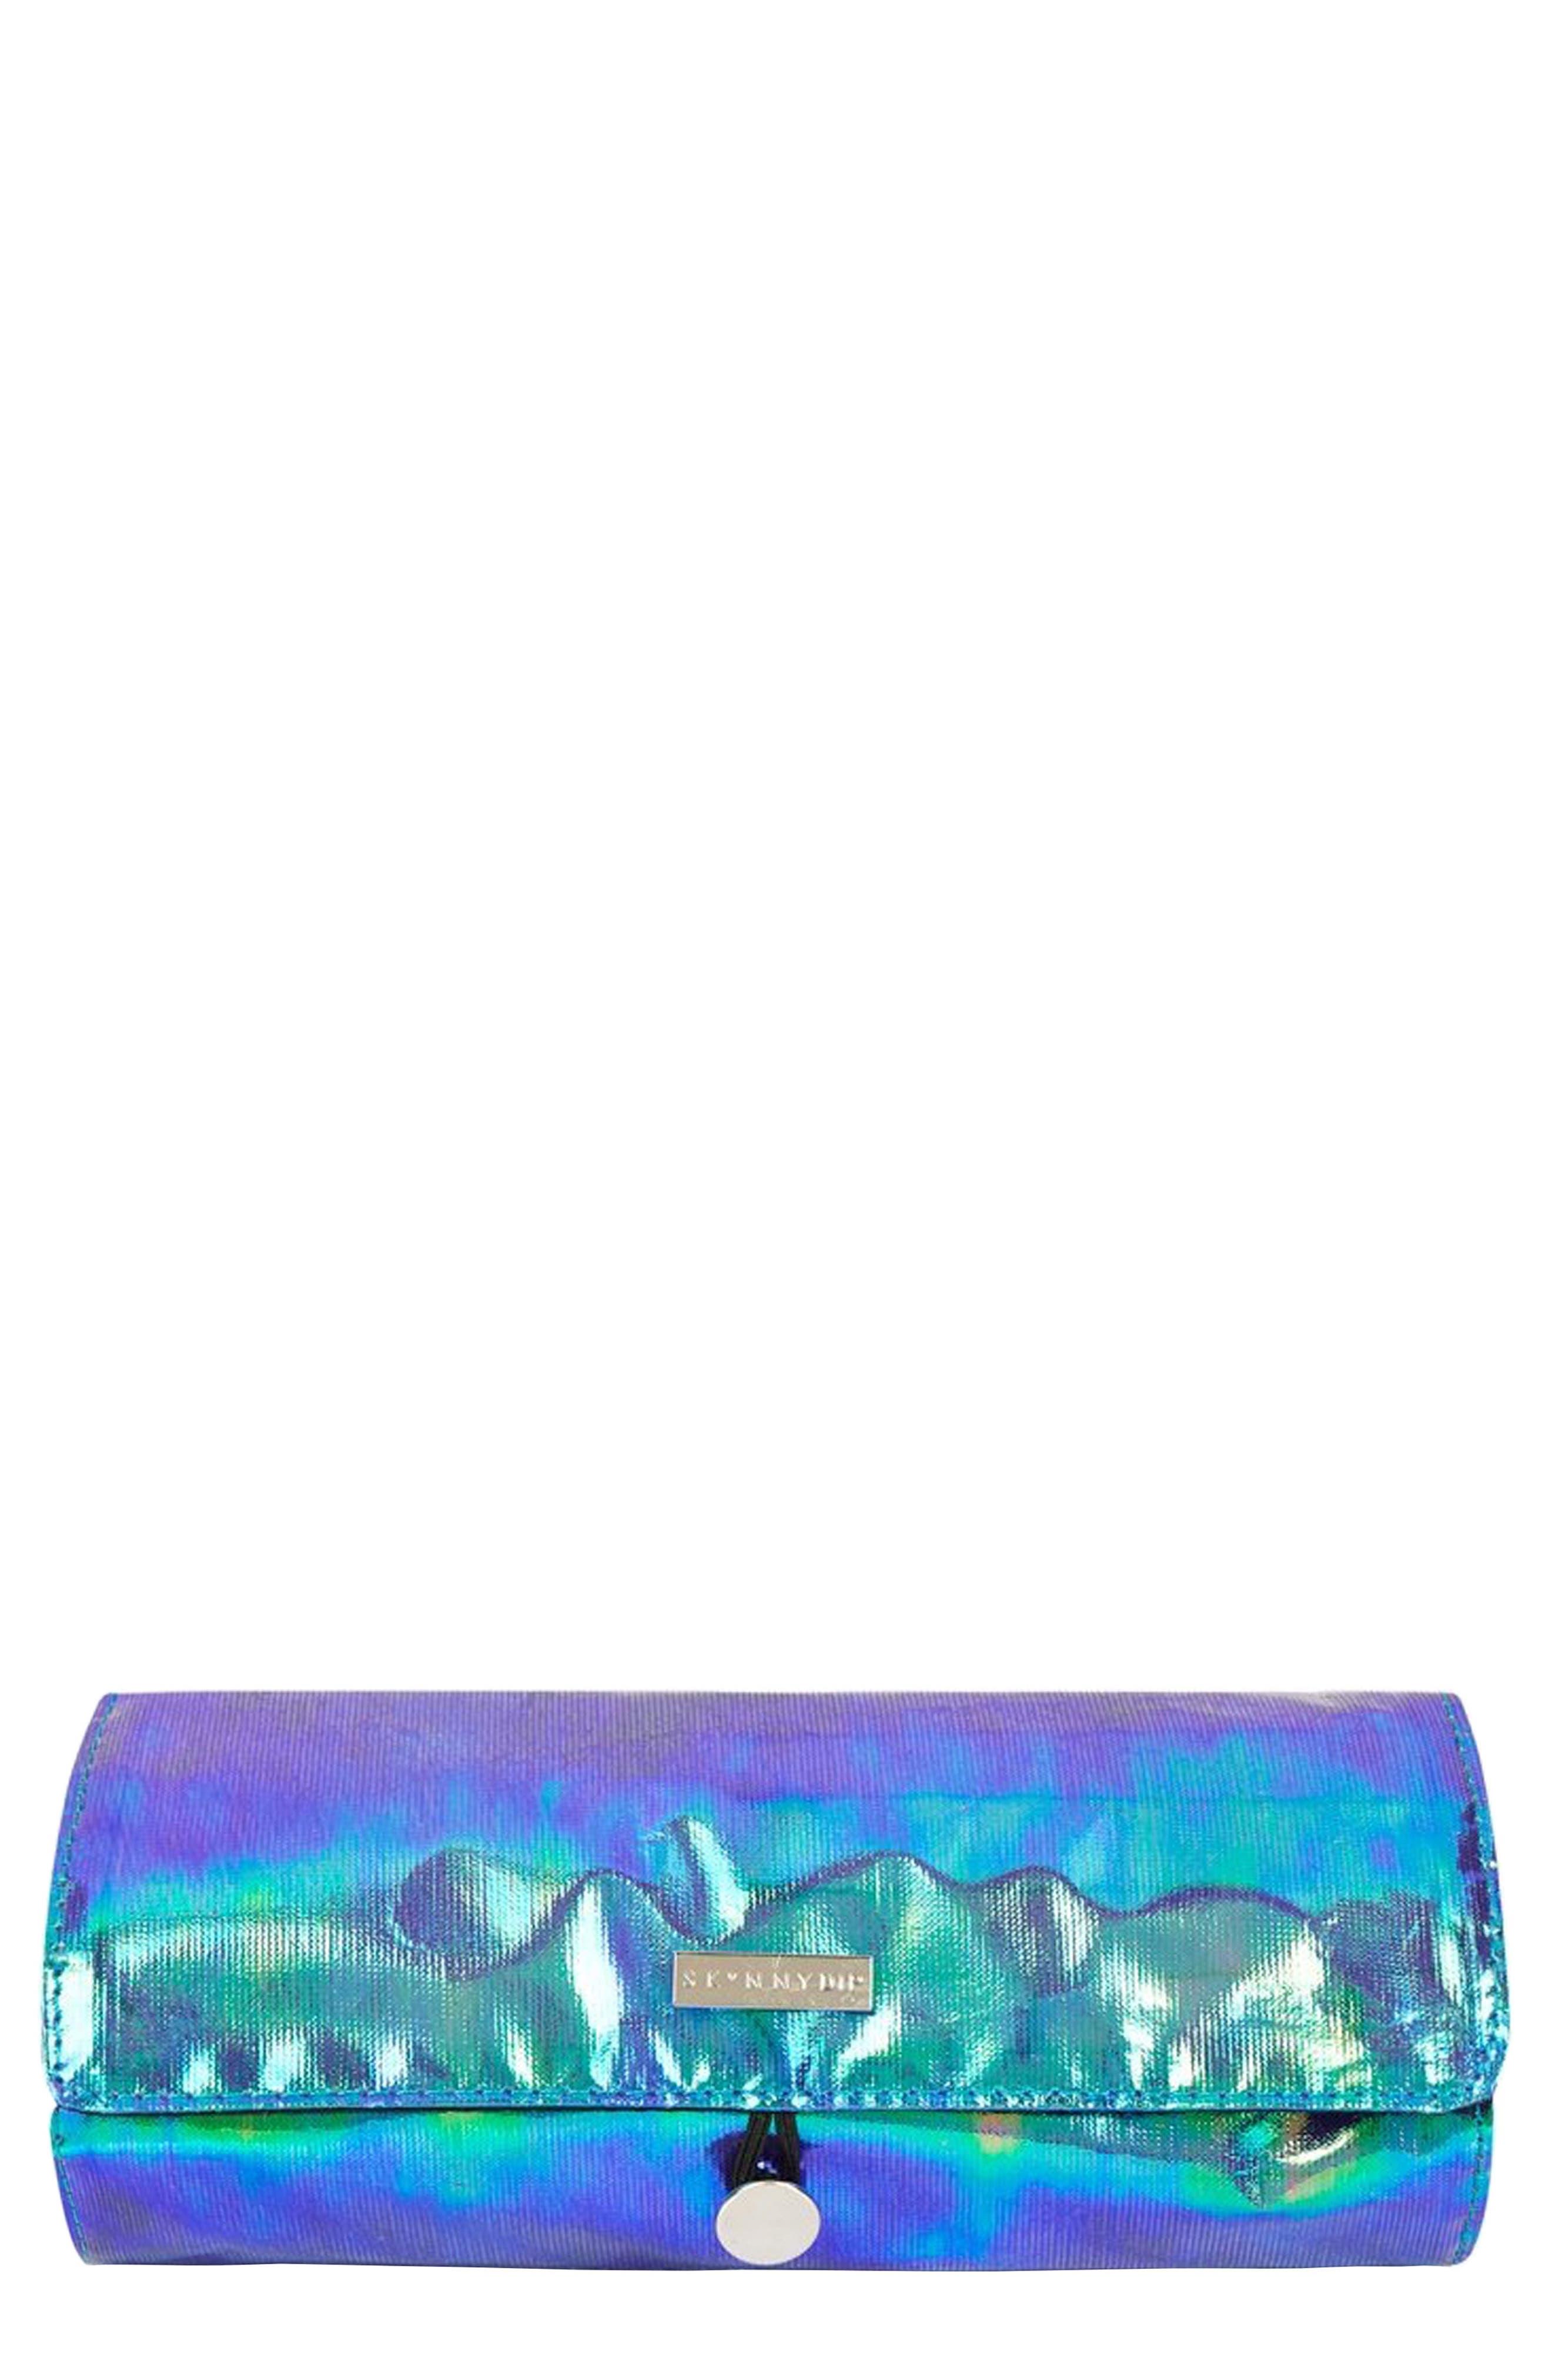 SKINNYDIP,                             Mermaid Makeup Roll,                             Main thumbnail 1, color,                             000